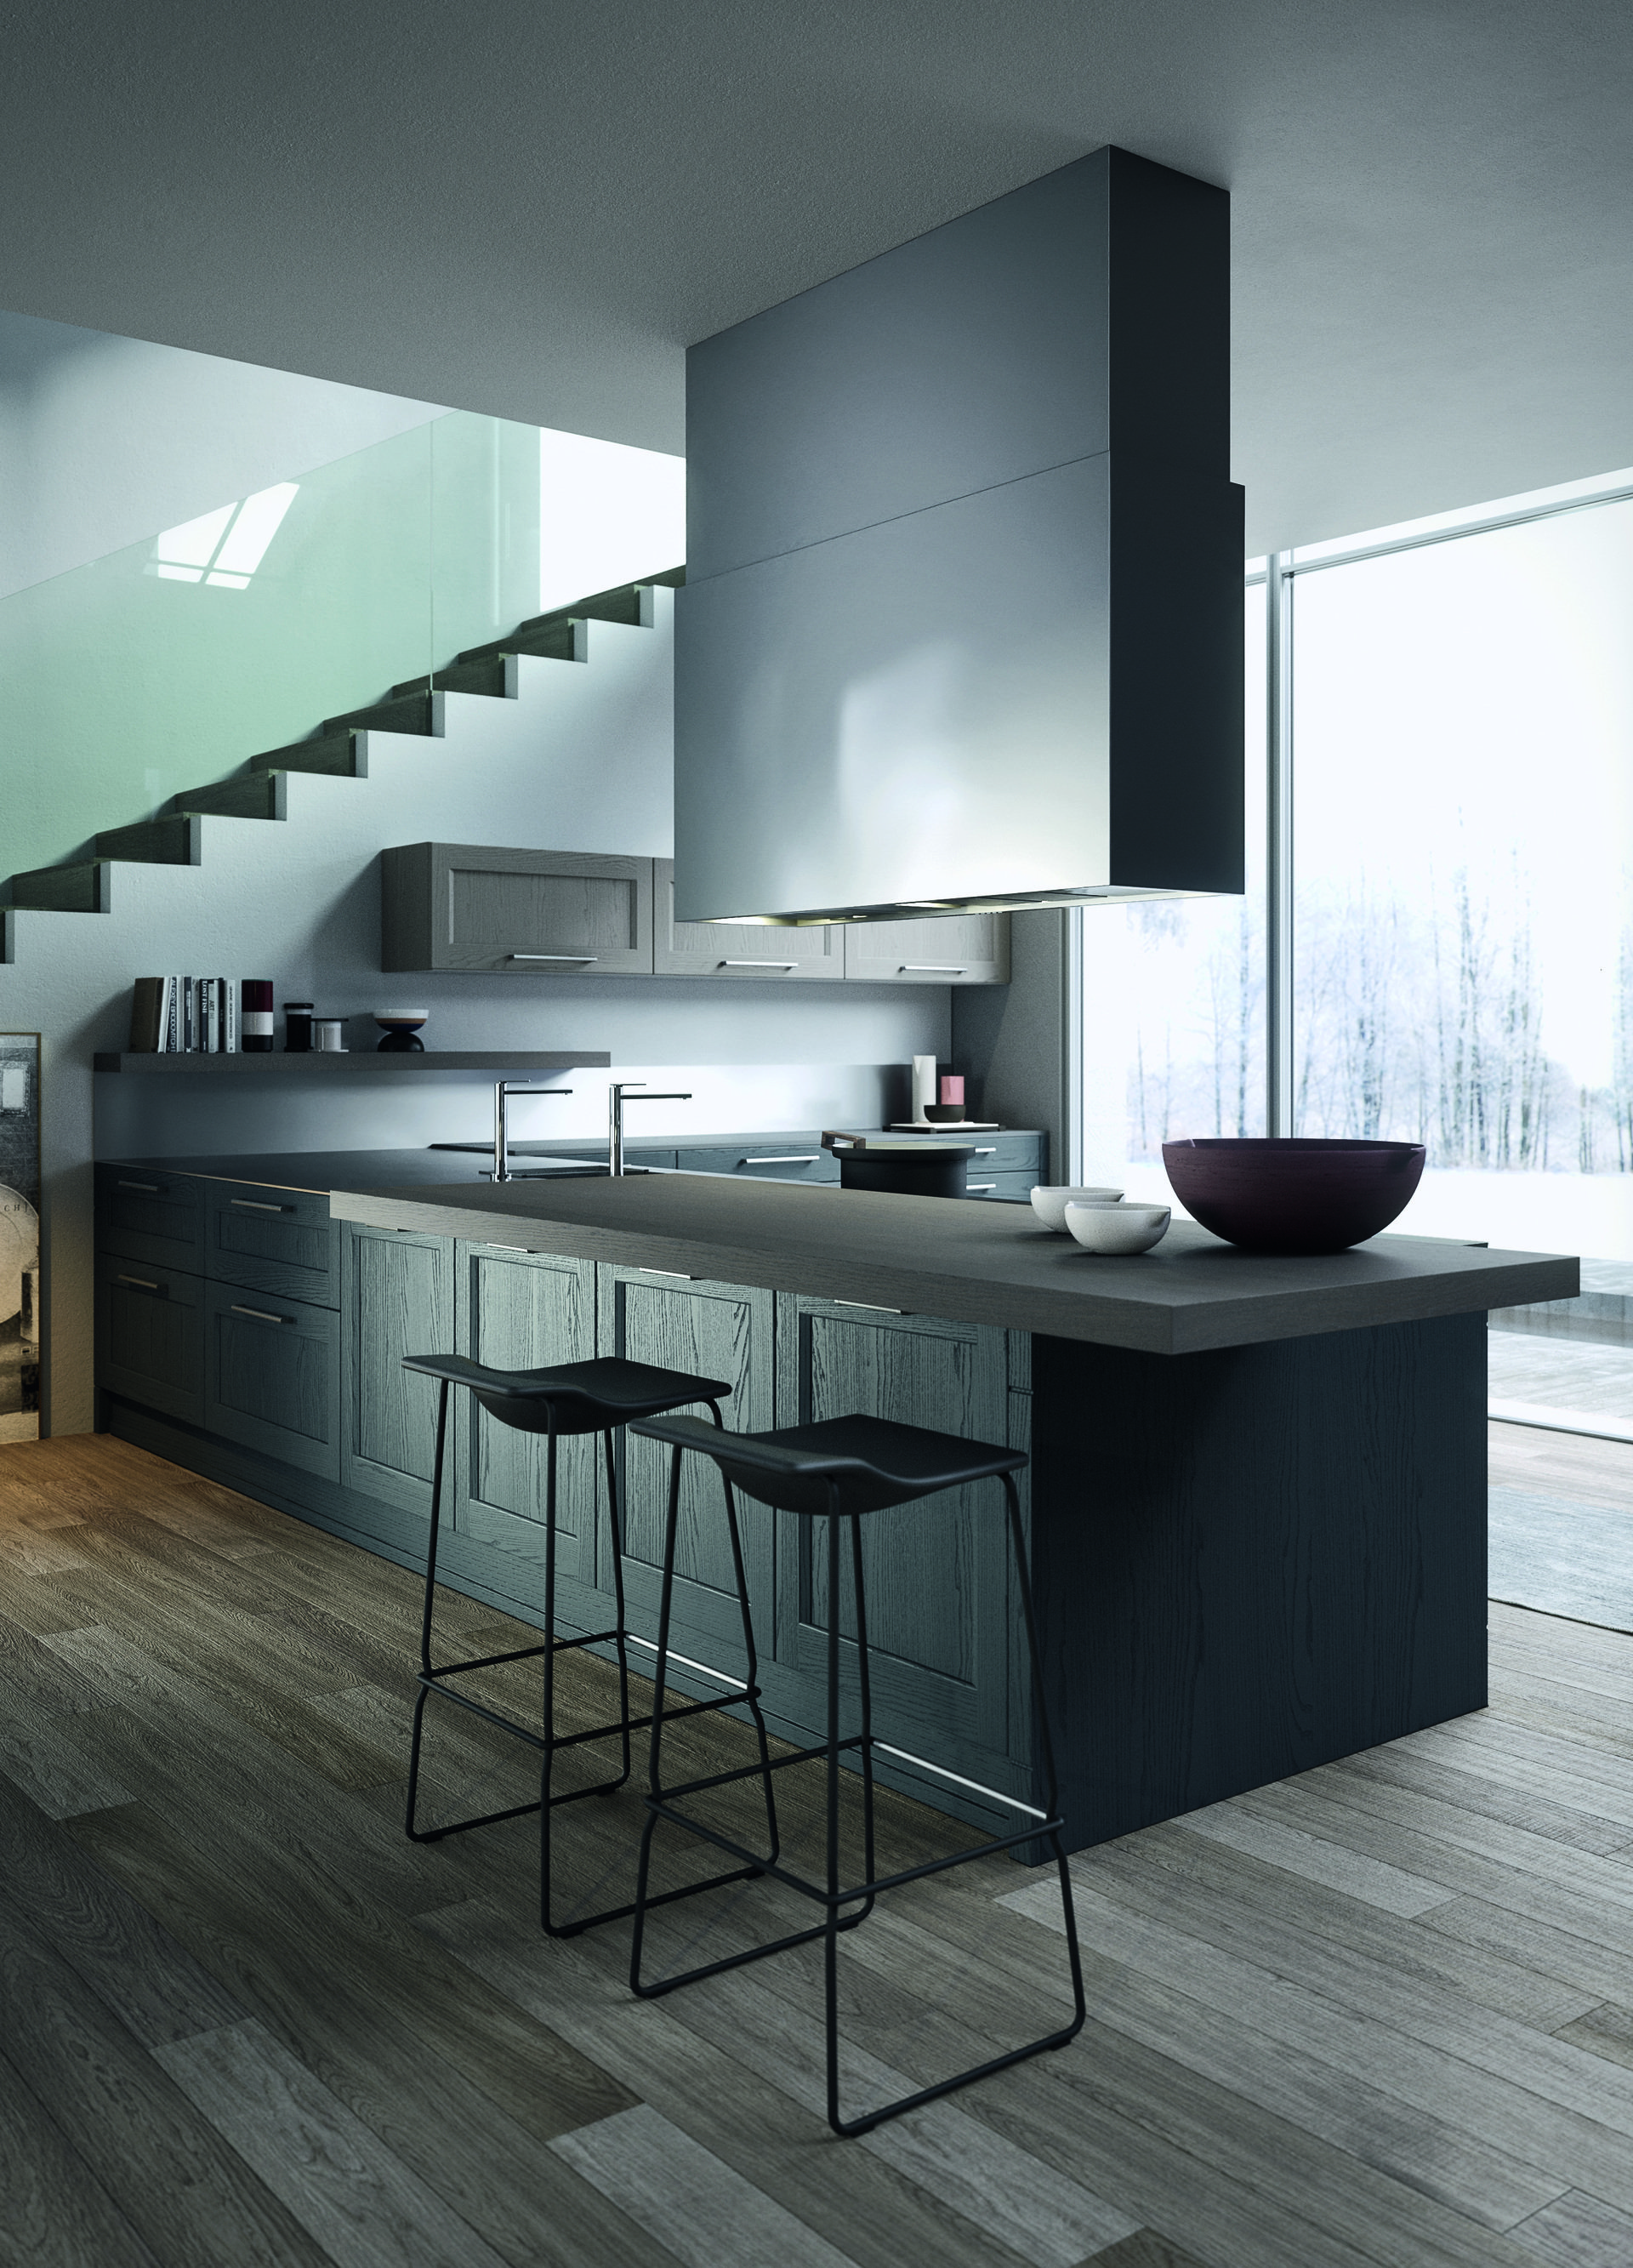 Cucina in legno moderna con isola